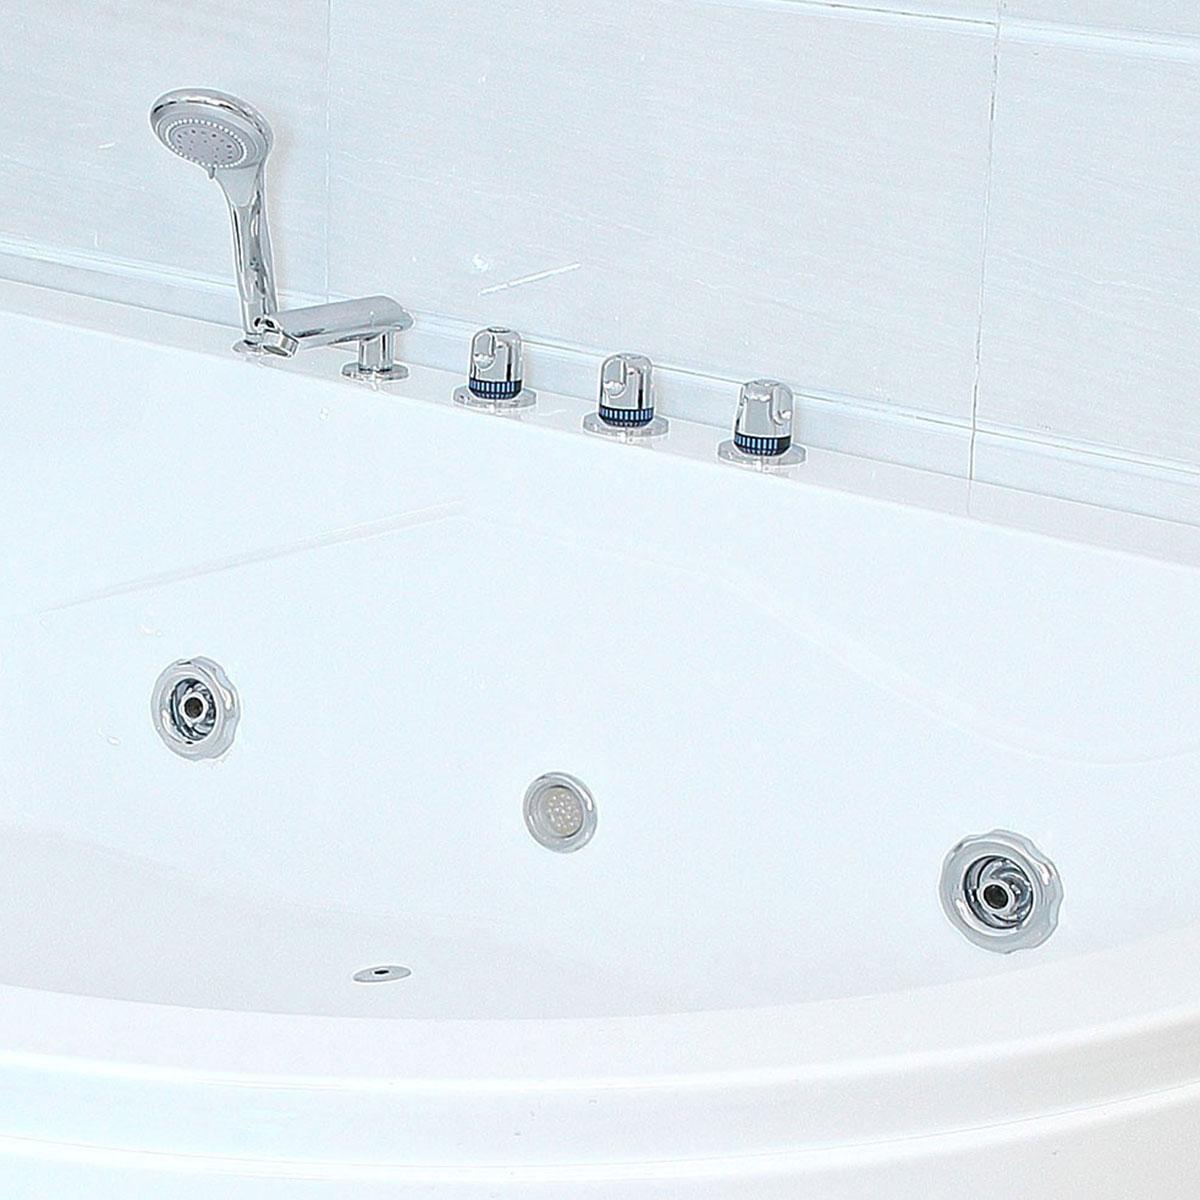 xxl luxus whirlpool badewanne bali links mit 14 massage d sen armaturen spa f r bad linke. Black Bedroom Furniture Sets. Home Design Ideas